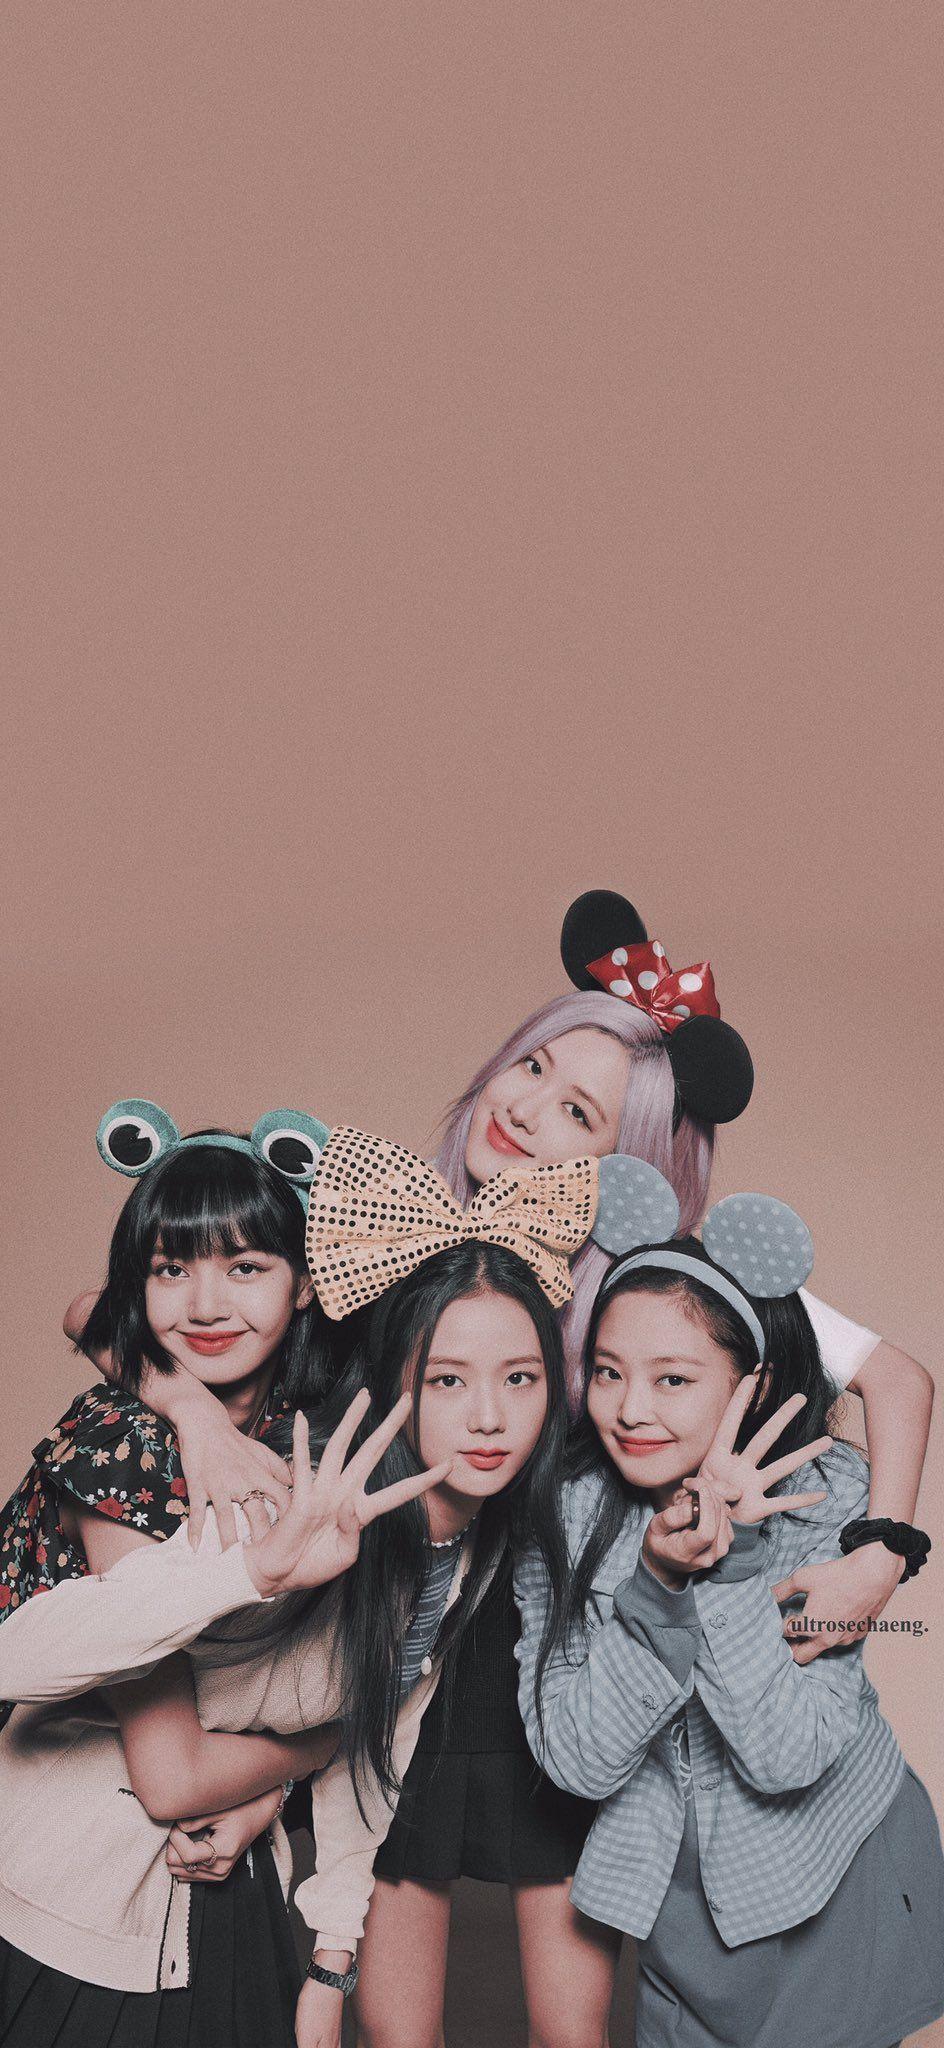 Kae On Twitter Blackpink Poster Black Pink Kpop Blackpink Jisoo